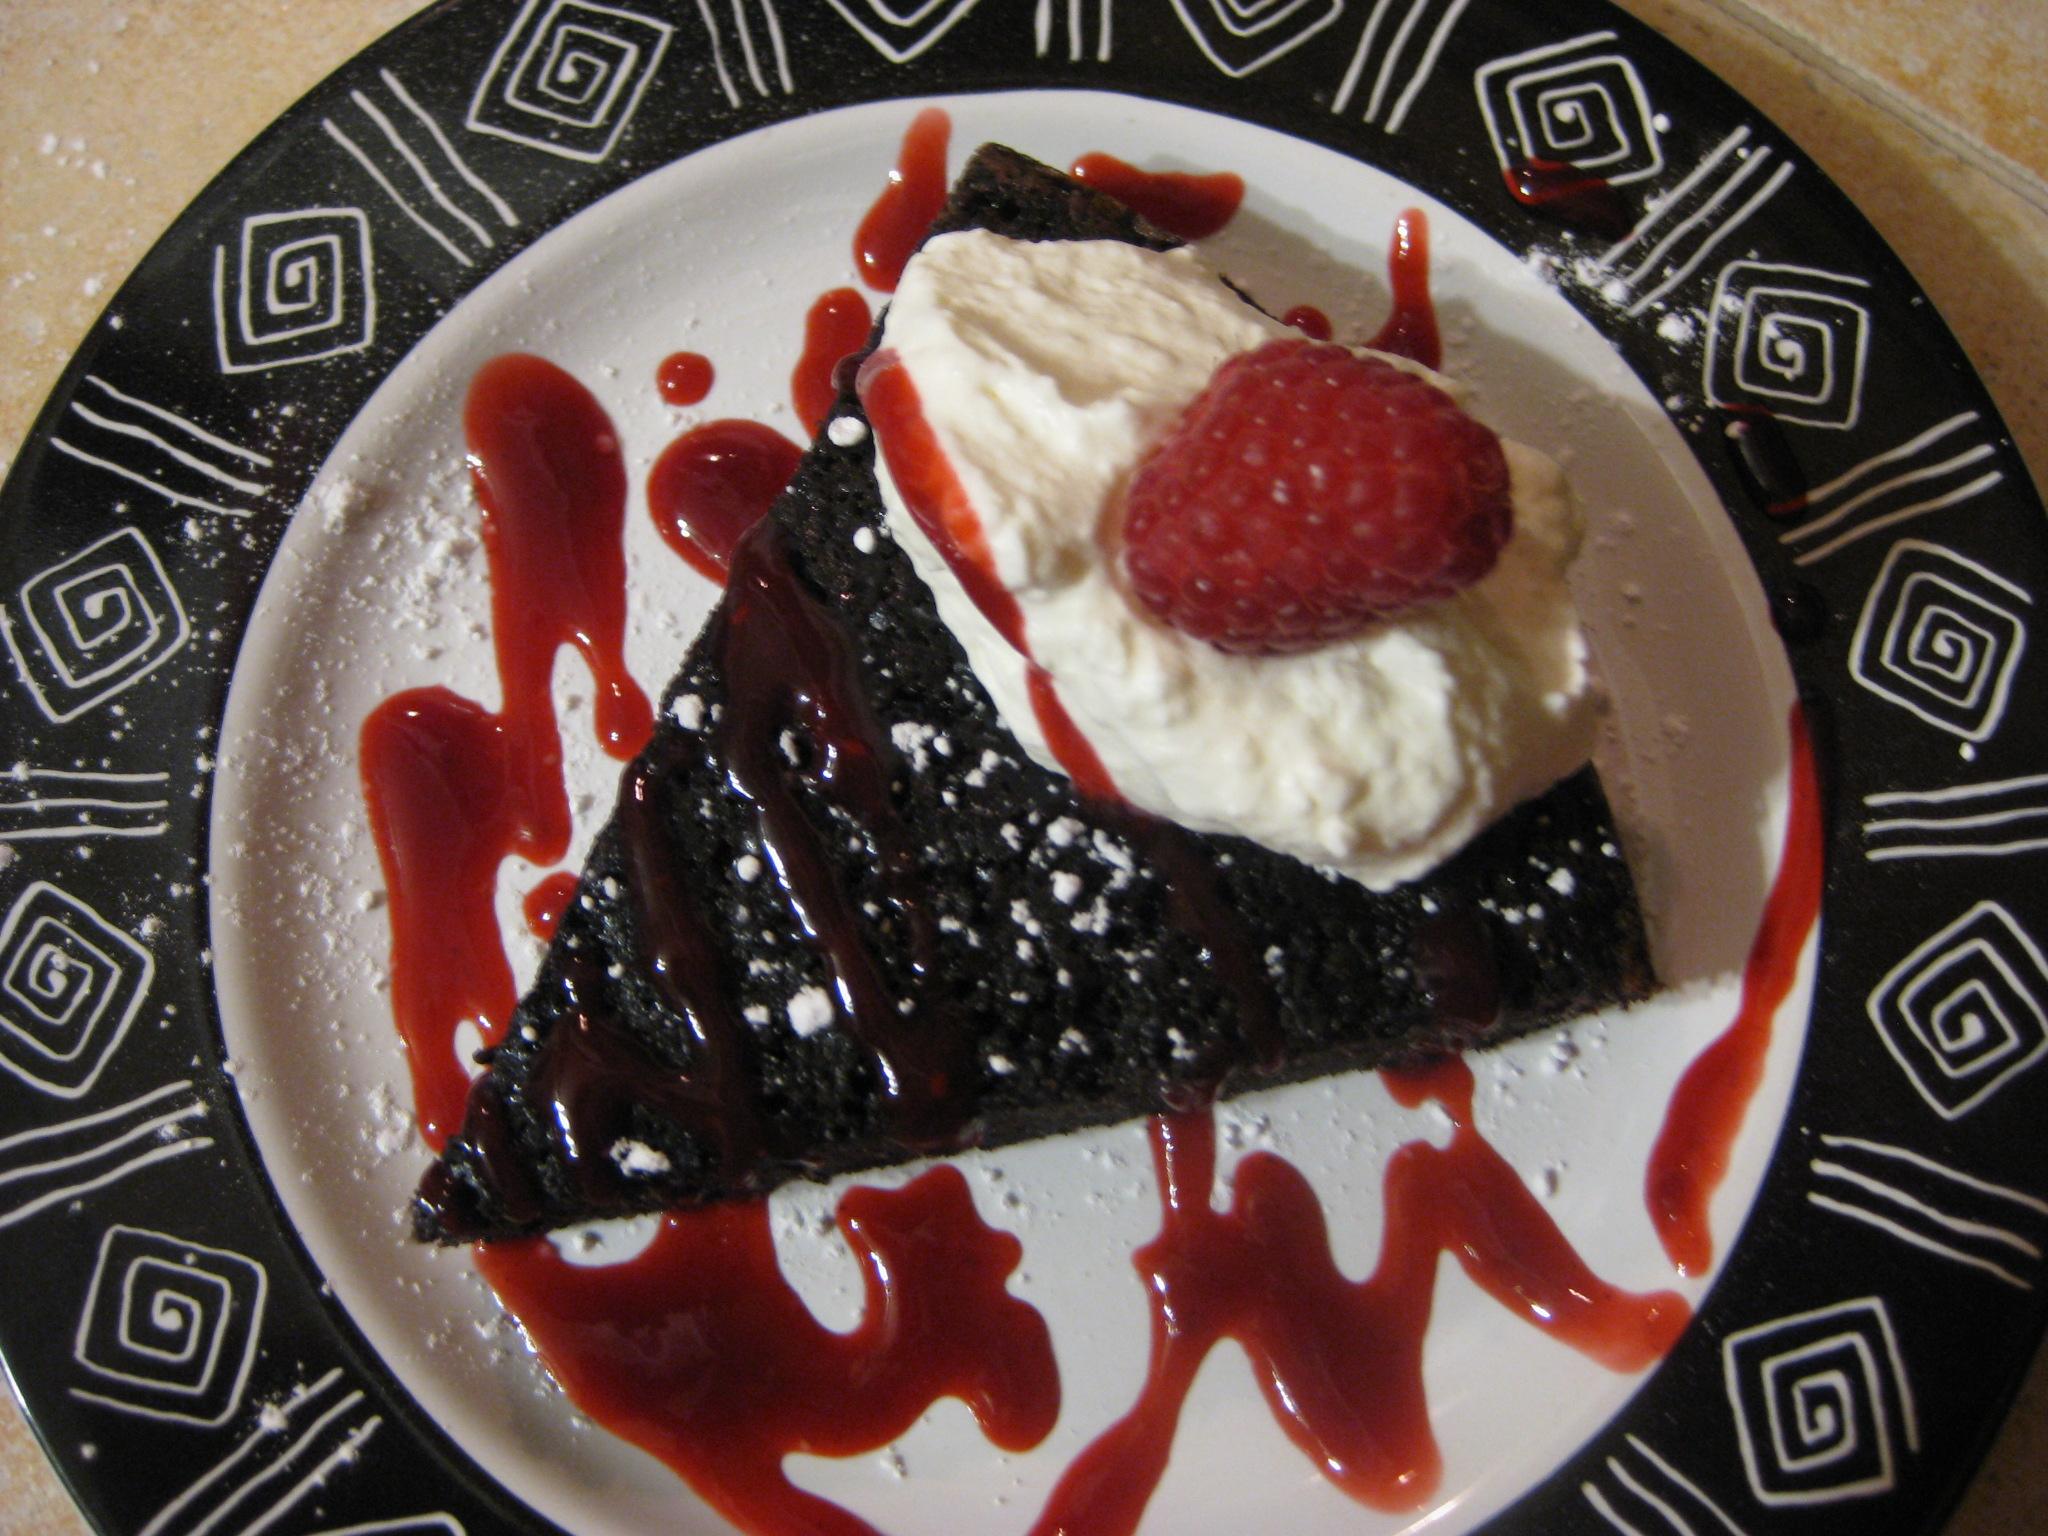 Chocolate Cake wRaspberry Sauce and White Chocolate Whipped Cream